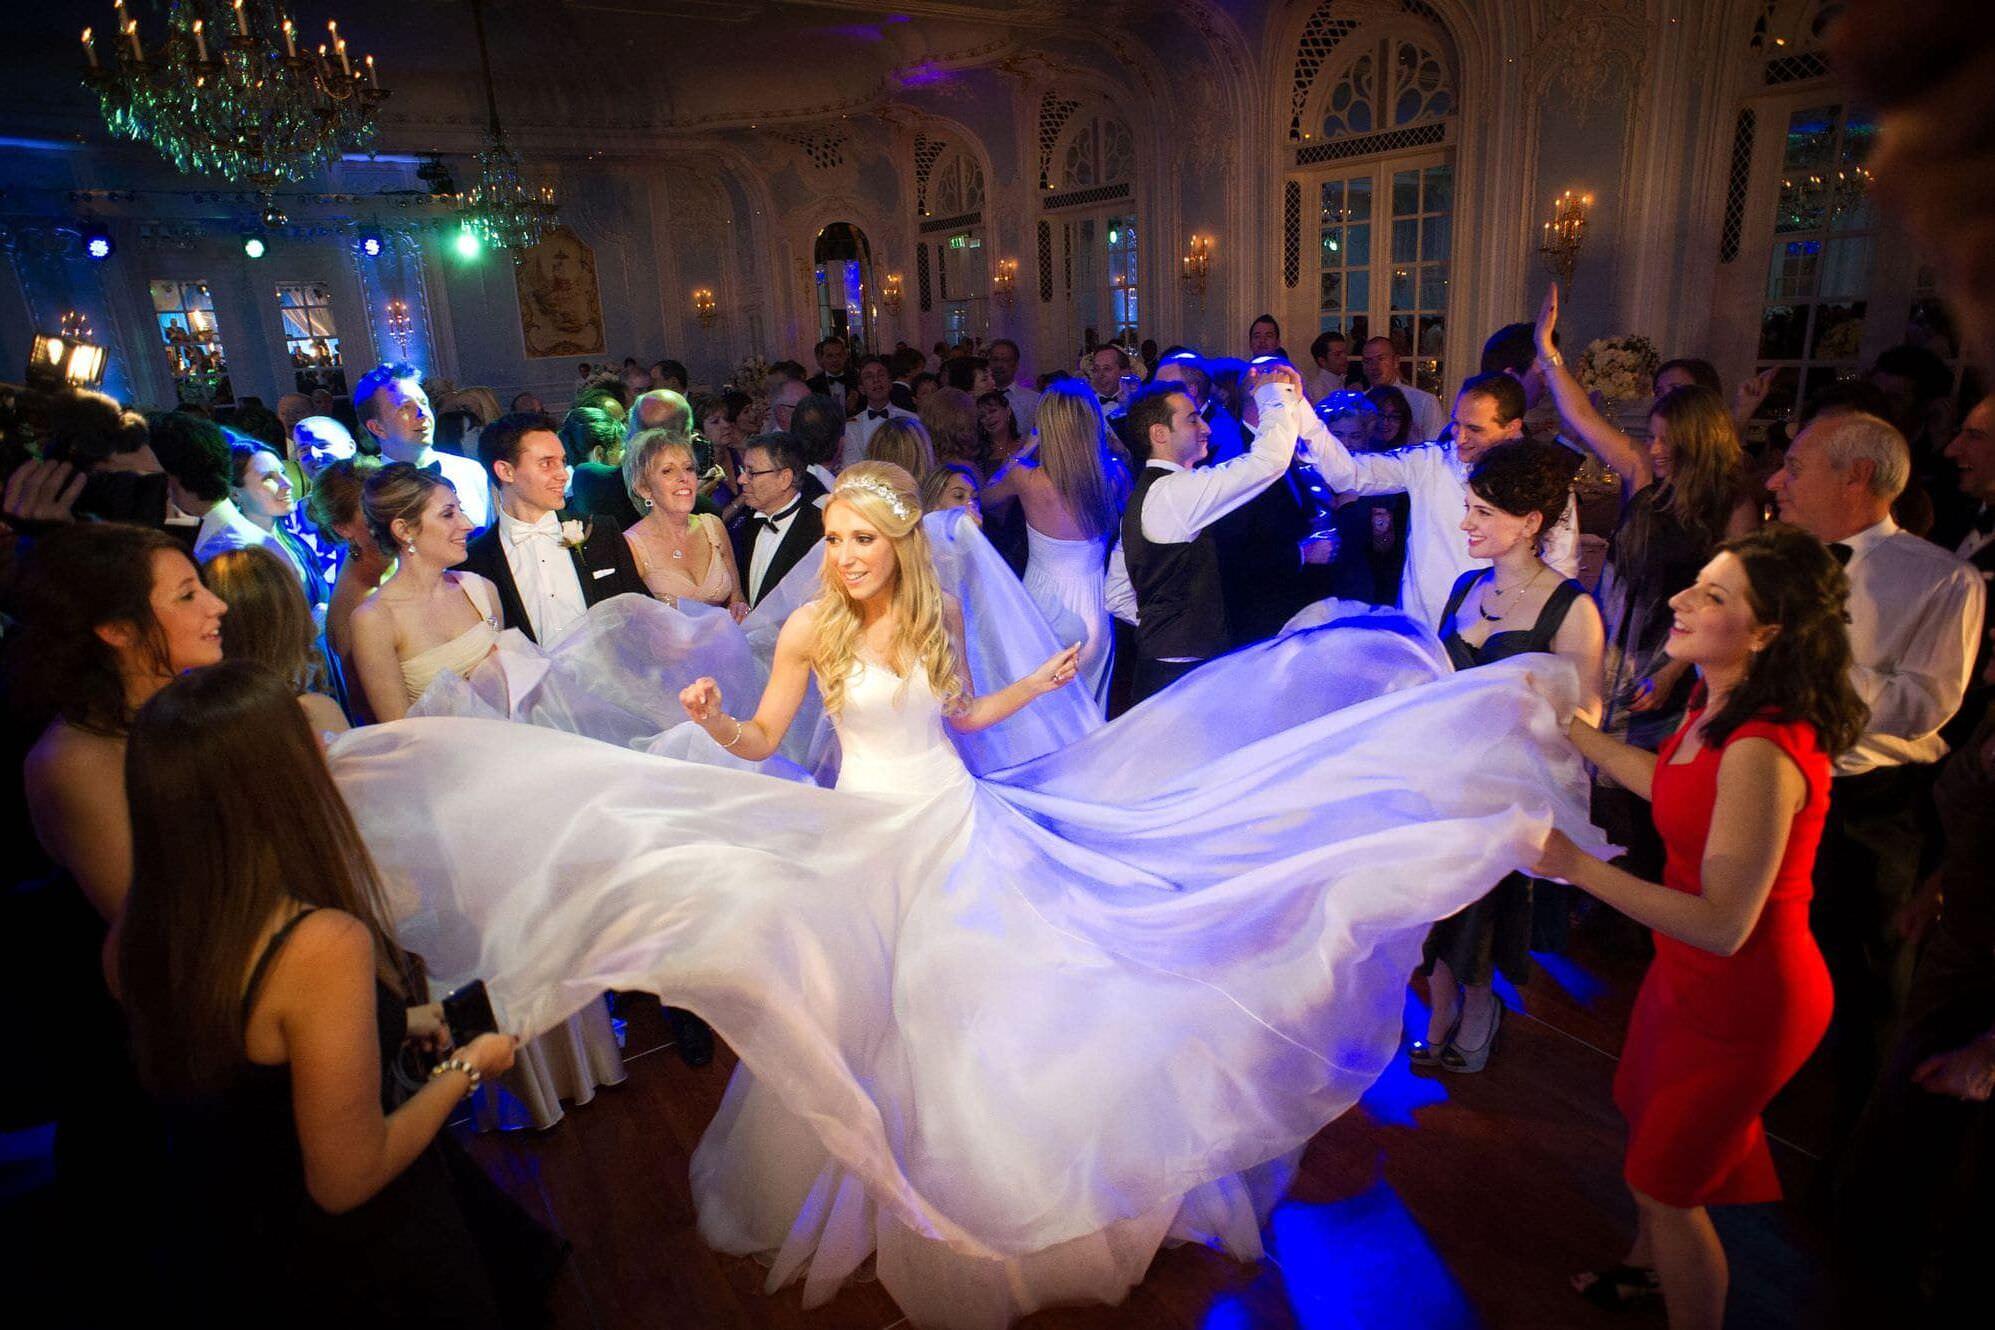 Mark-Seymour-Wedding-Photographer-UK-26 28